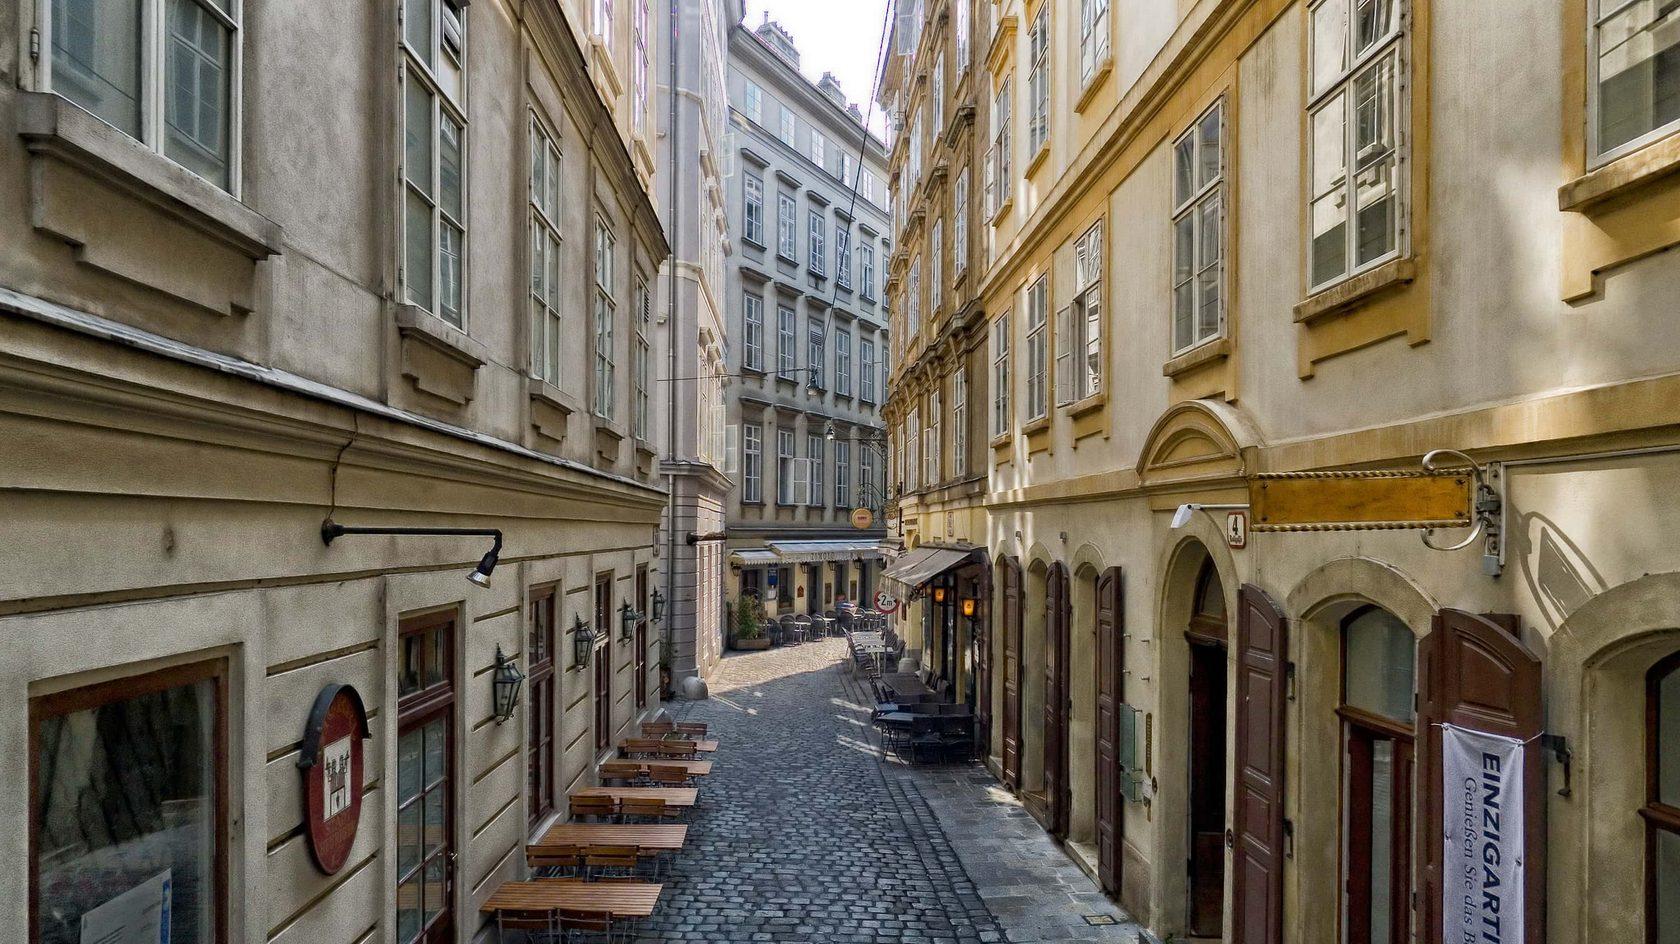 Сколько стоит квартира в австрии дубай до и после